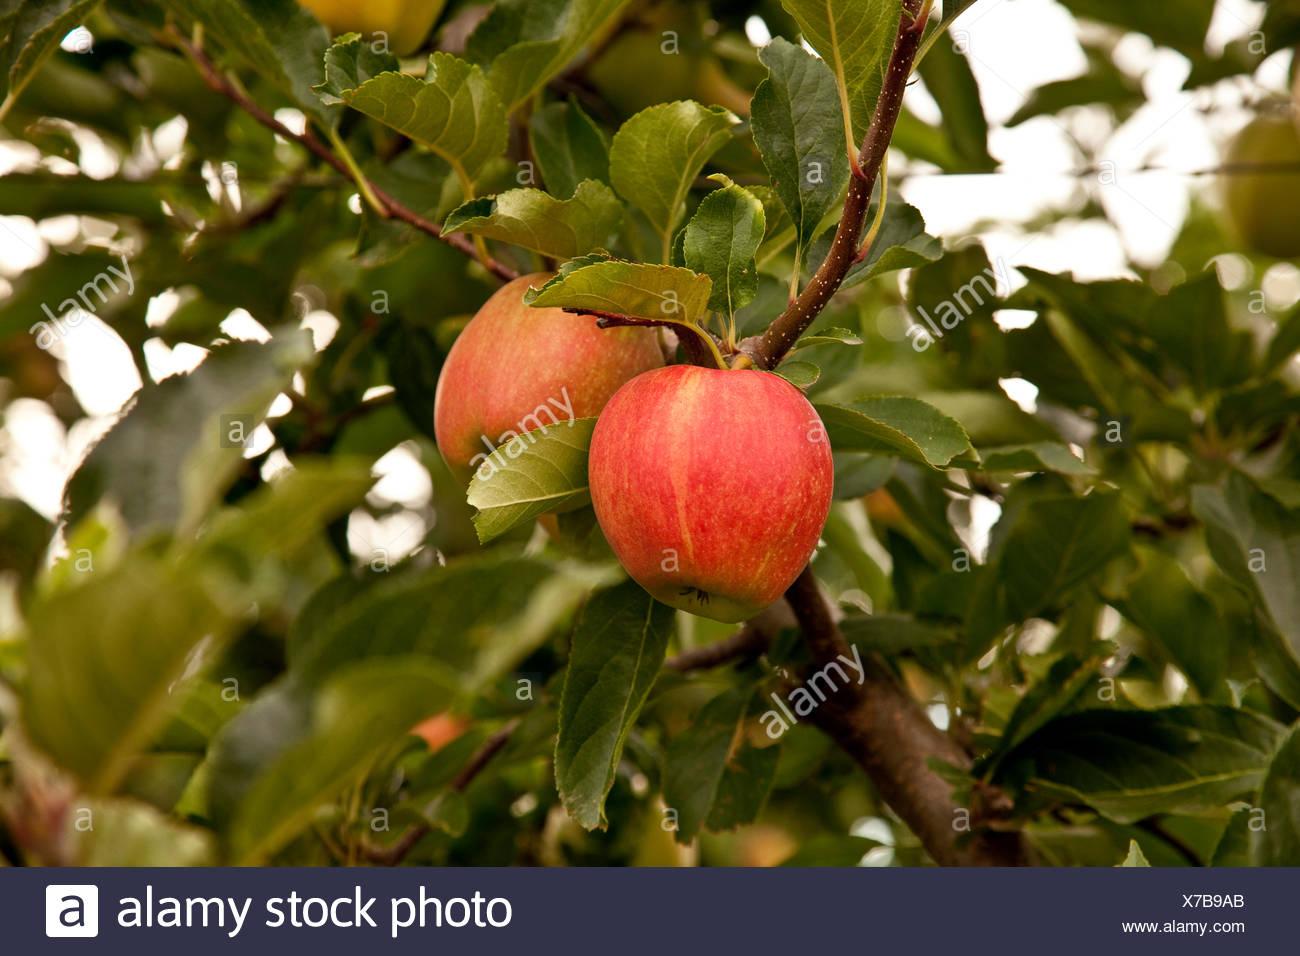 Gala apples ripen on tree, Okanagan Valley, BC, Canada. - Stock Image